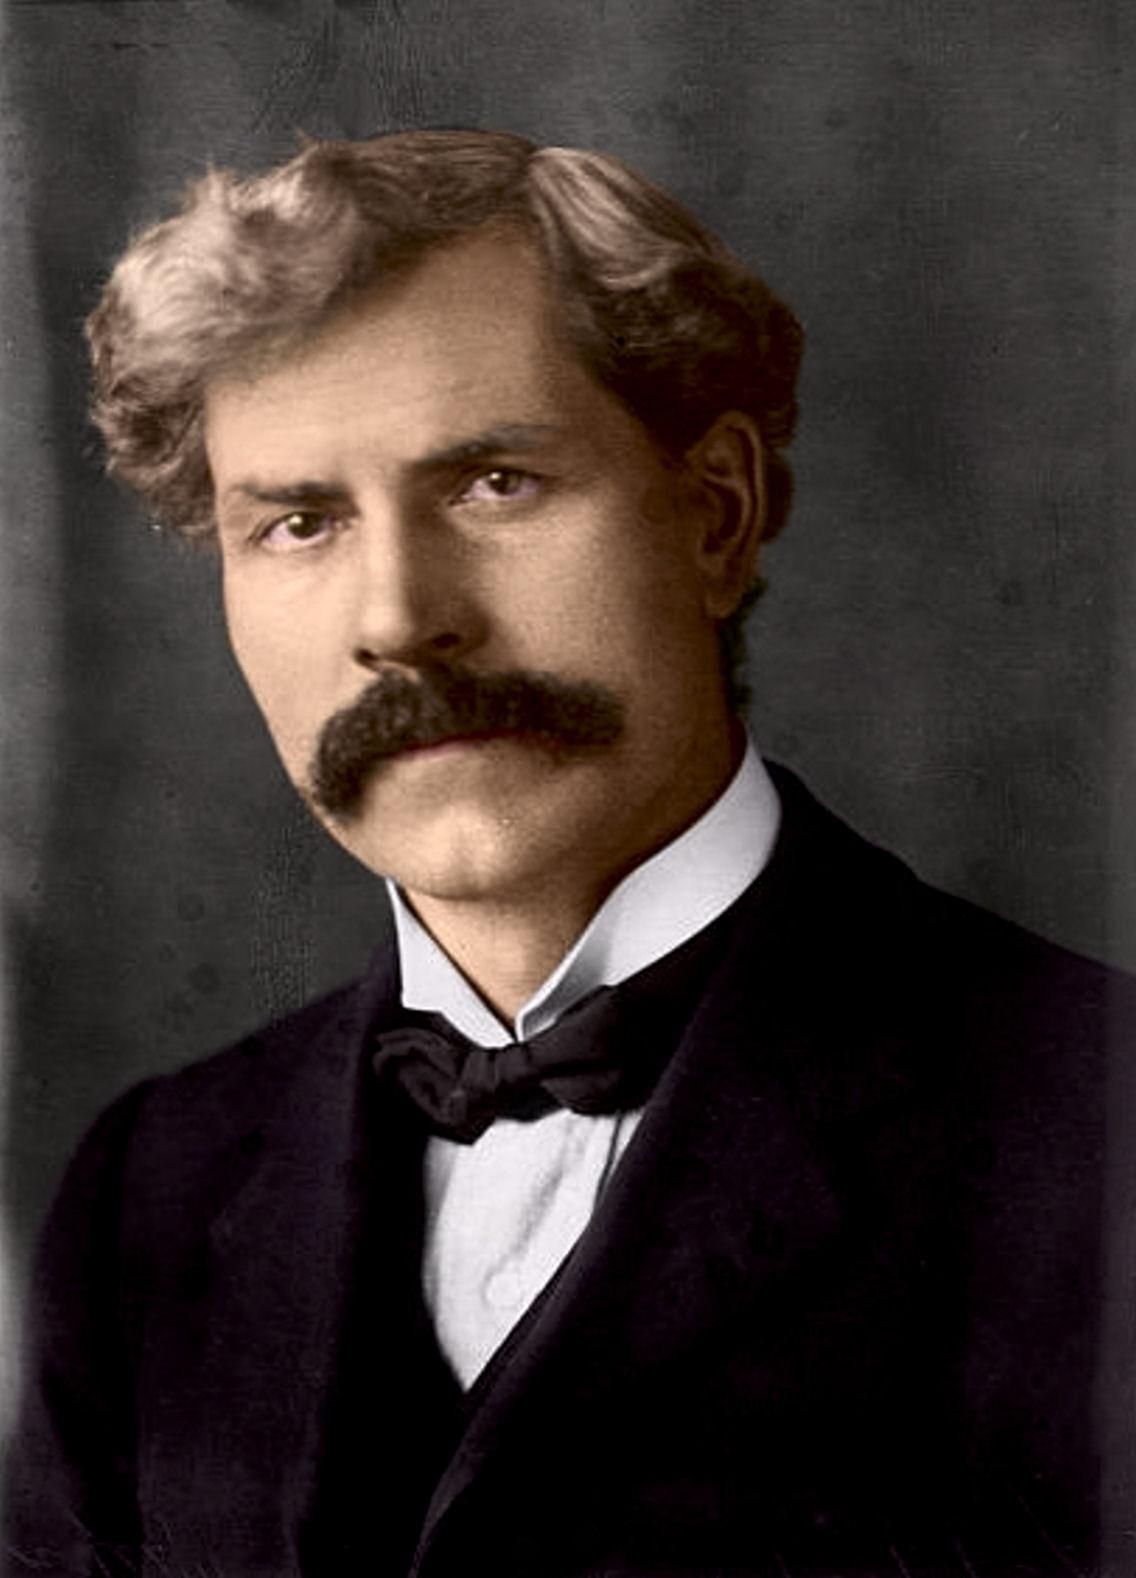 Ramsay_MacDonald_1900s